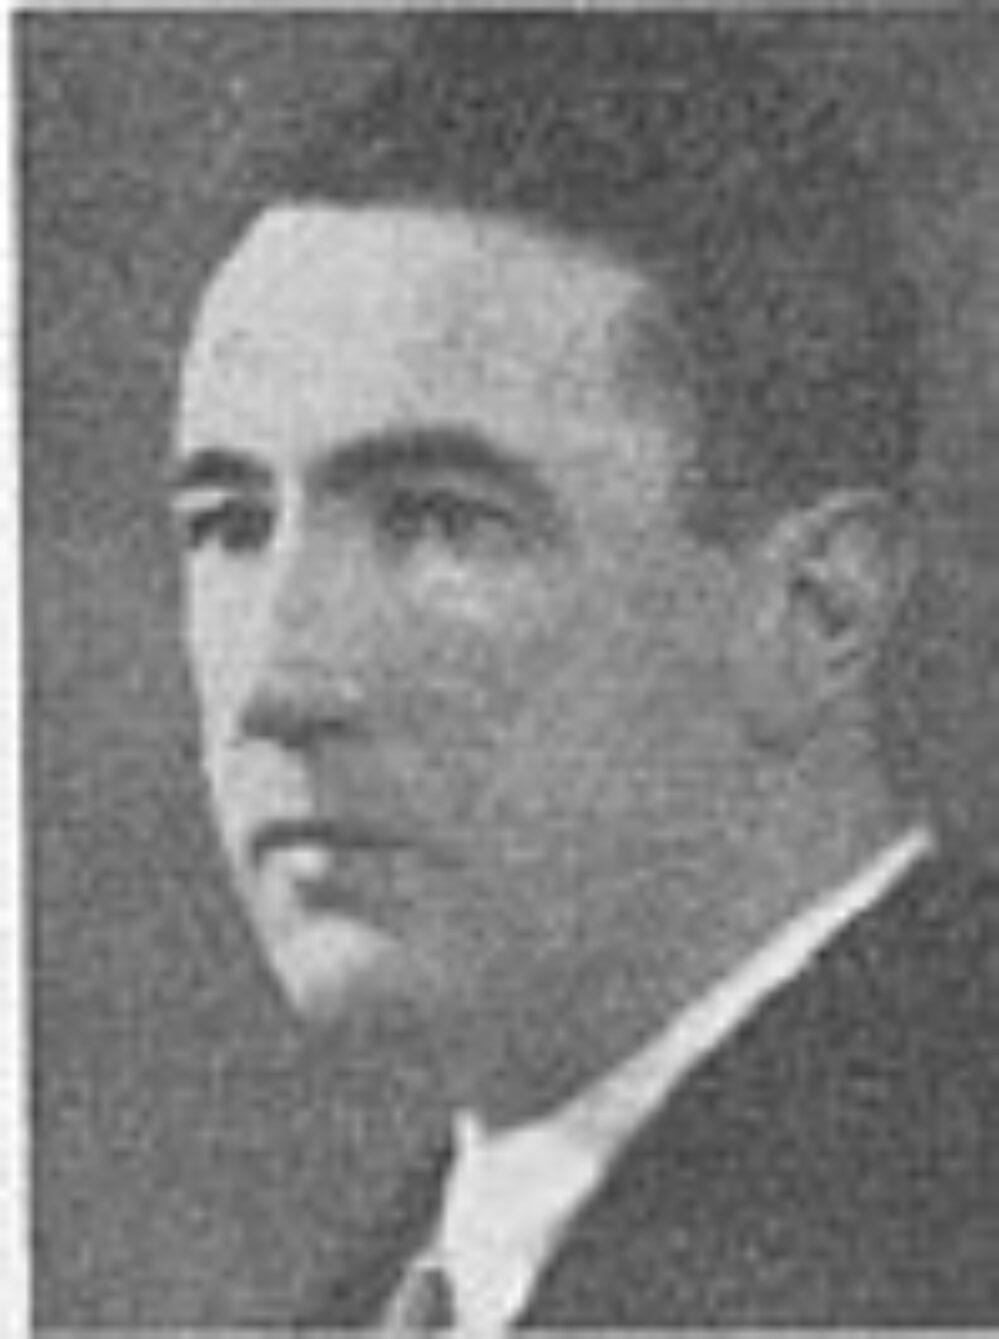 John Arnt Gustavsen